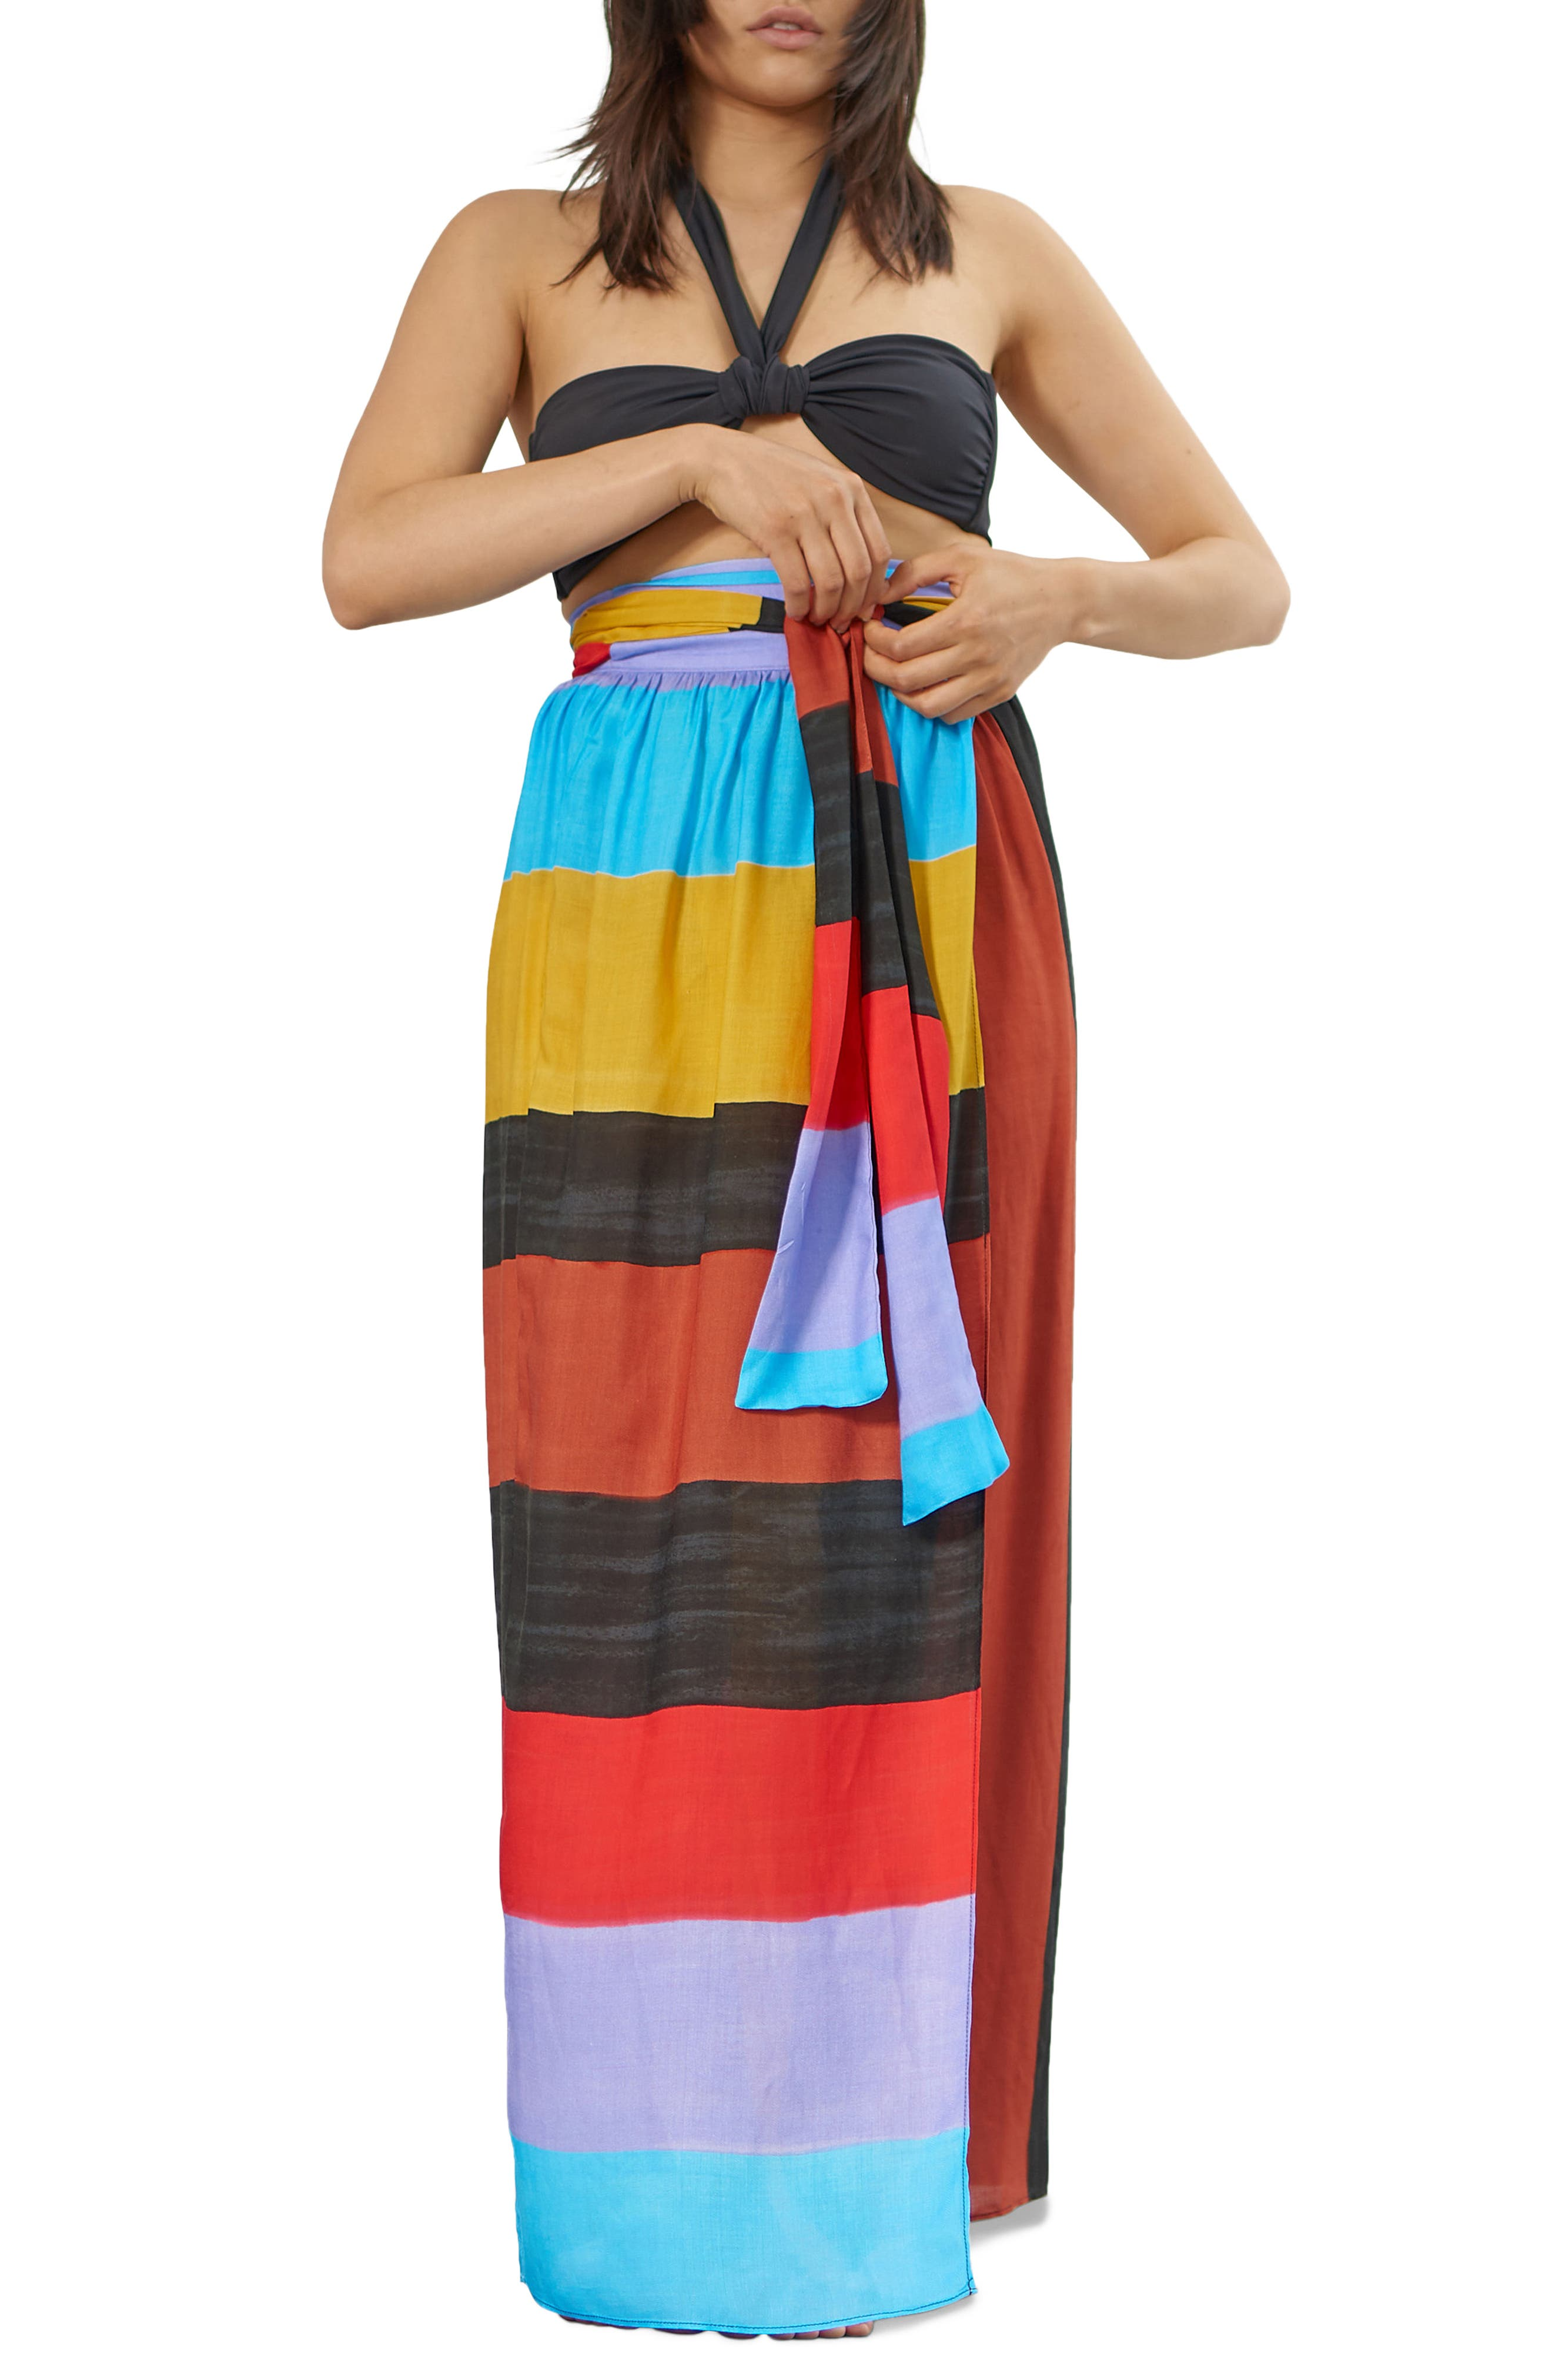 Cora Stripe Cover-Up Skirt,                         Main,                         color, Black Multi